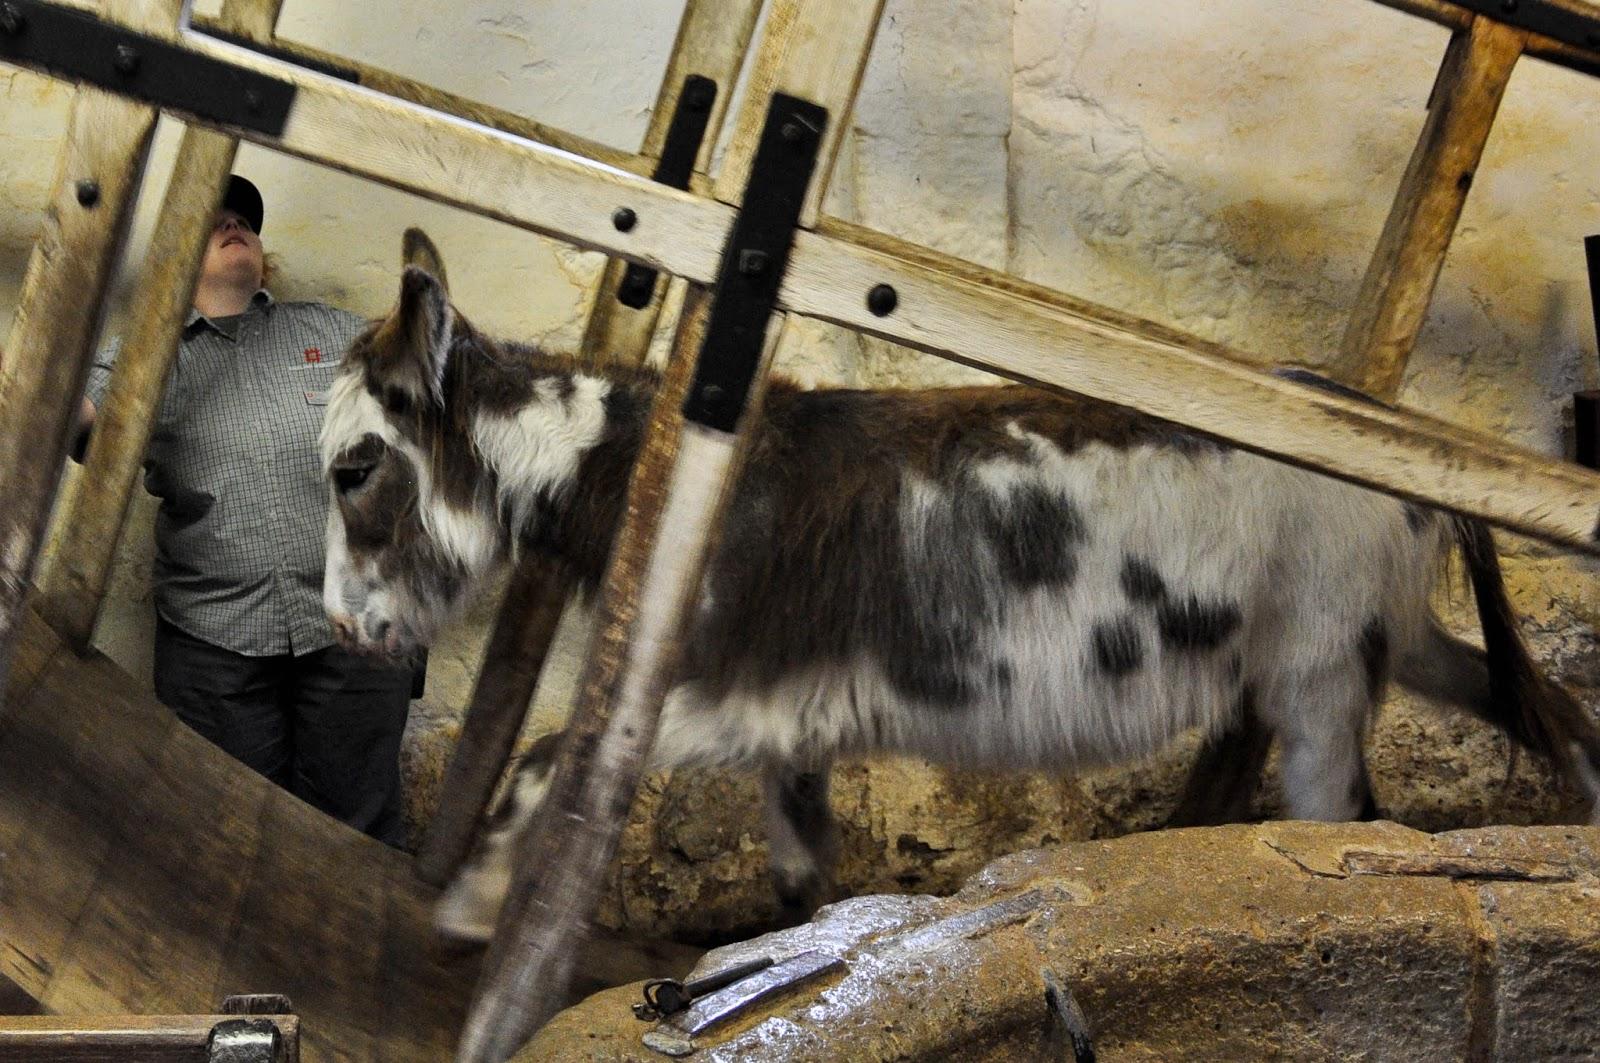 The donkey at work, Carisbrook Castle, Isle of Wight, UK